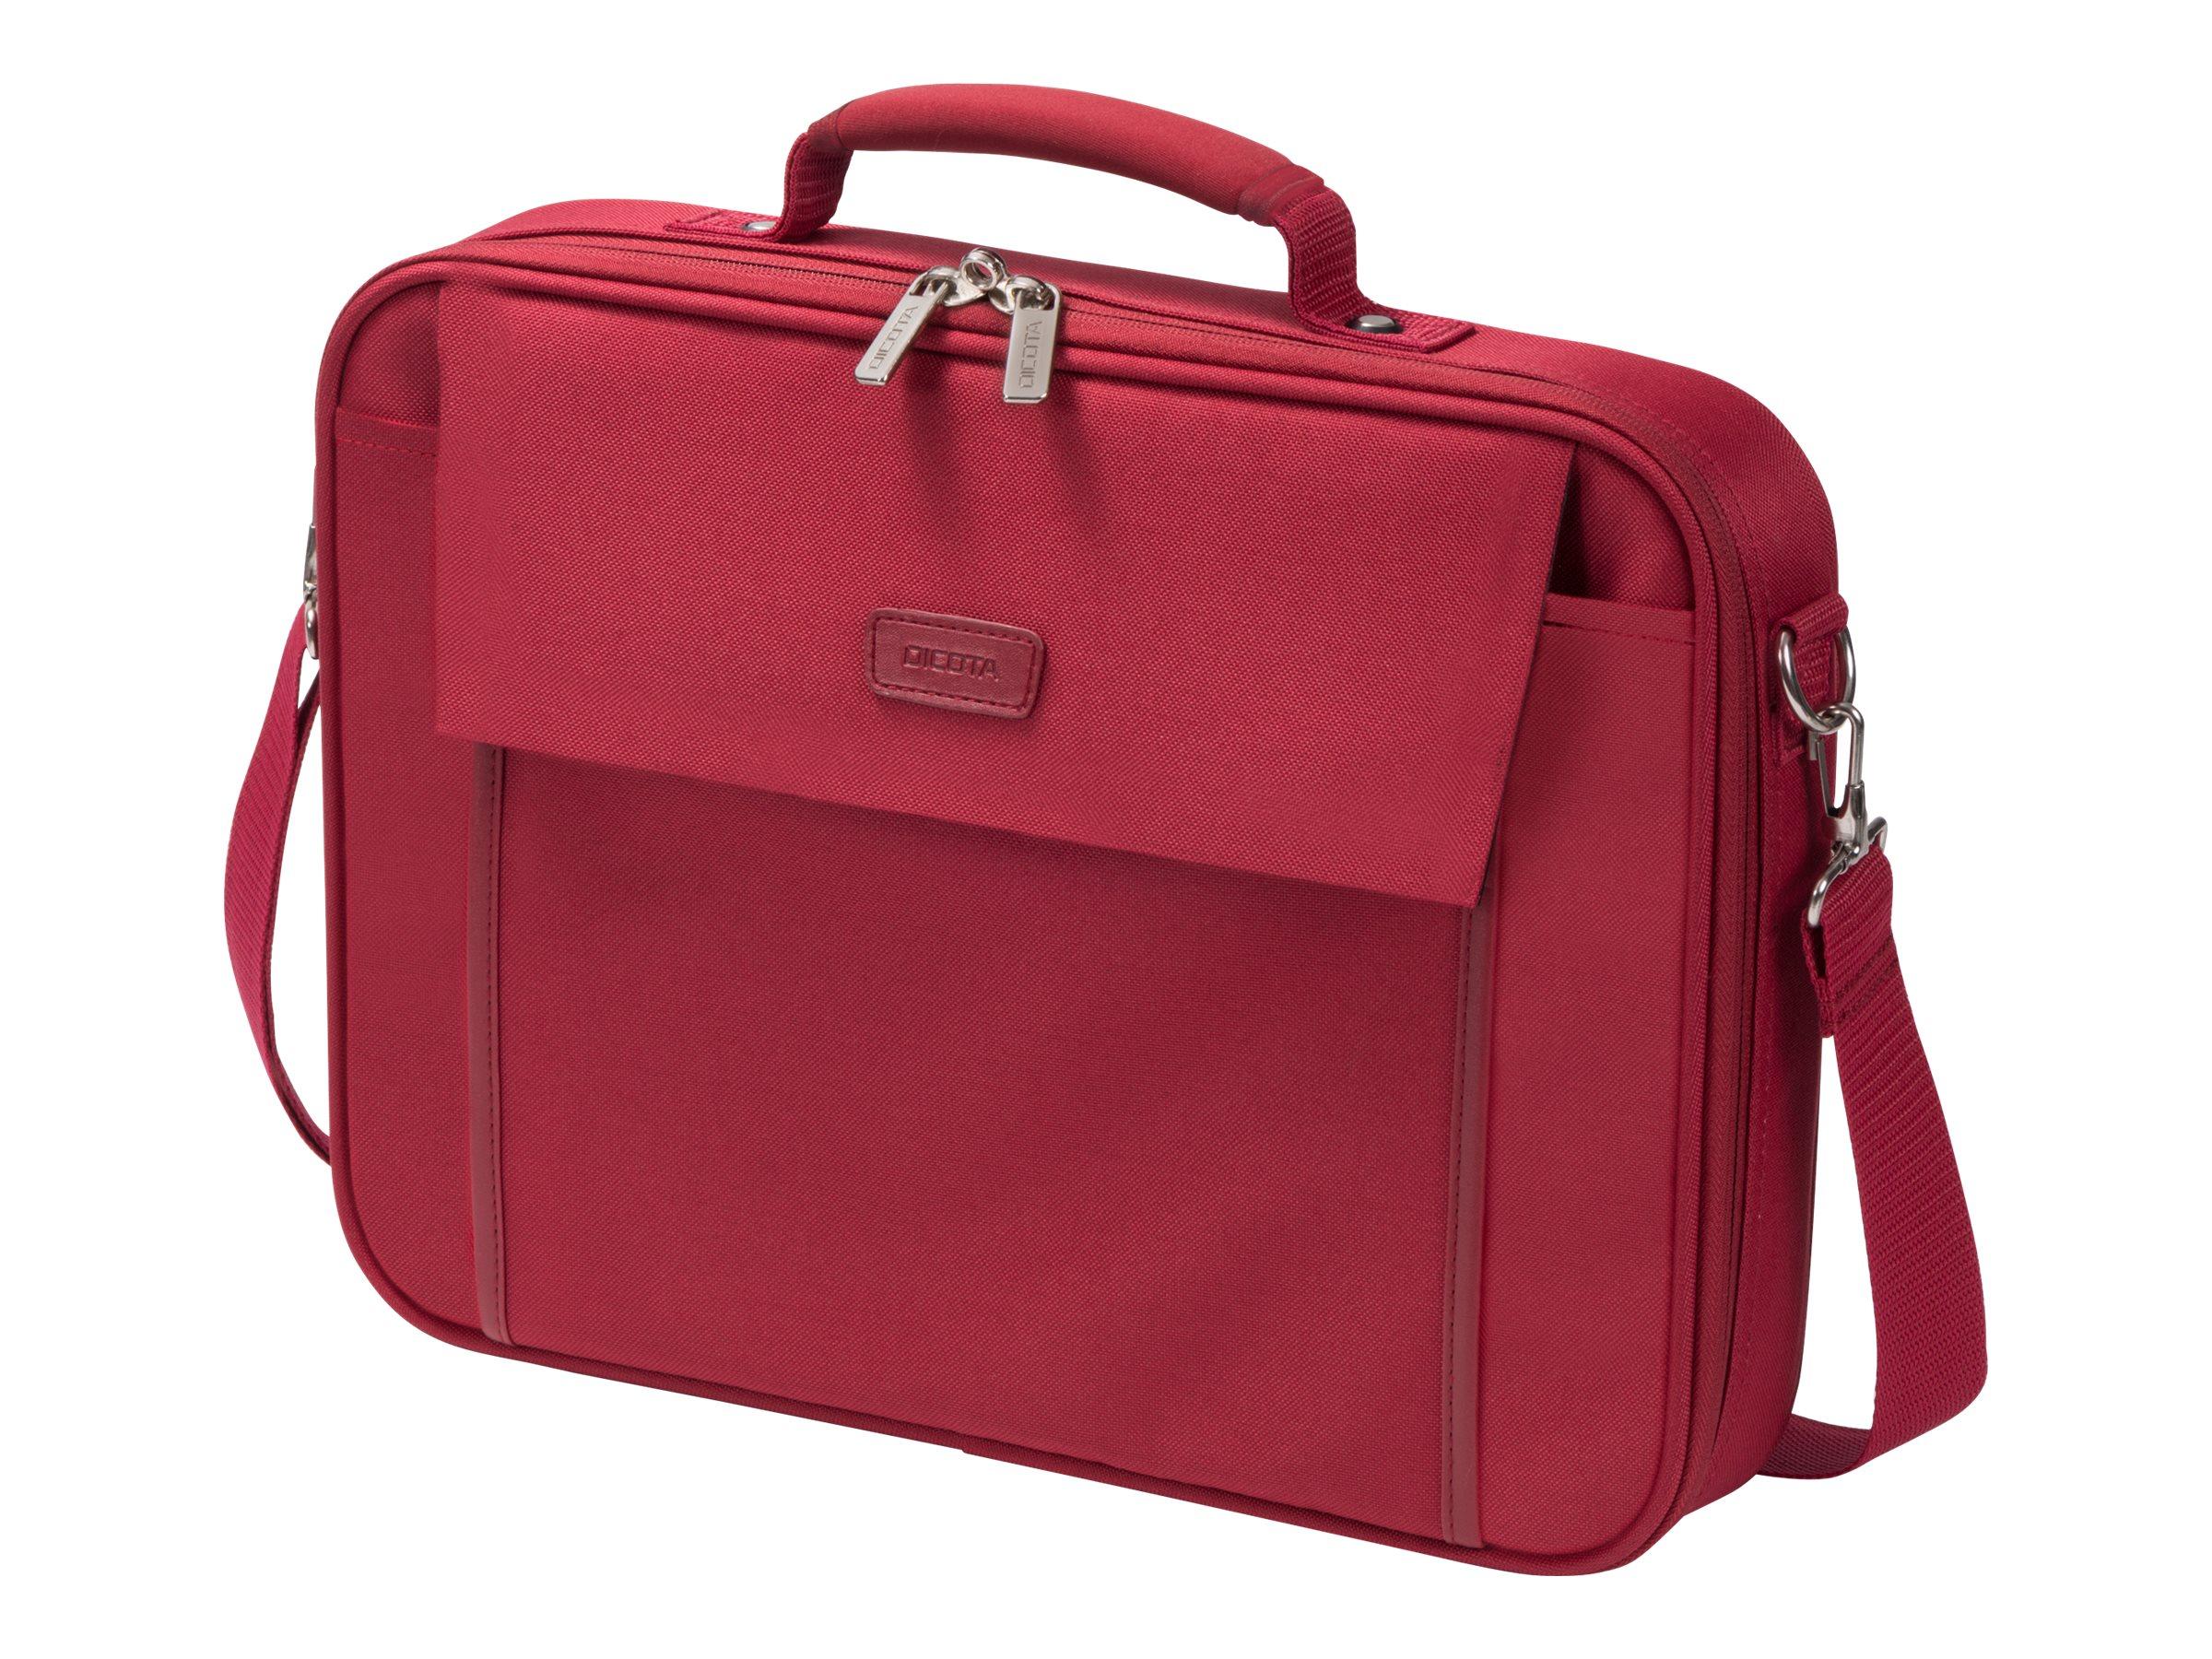 "Dicota Multi BASE Laptop Bag 17.3"" - Notebook-Tasche - 43.9 cm (17.3"")"